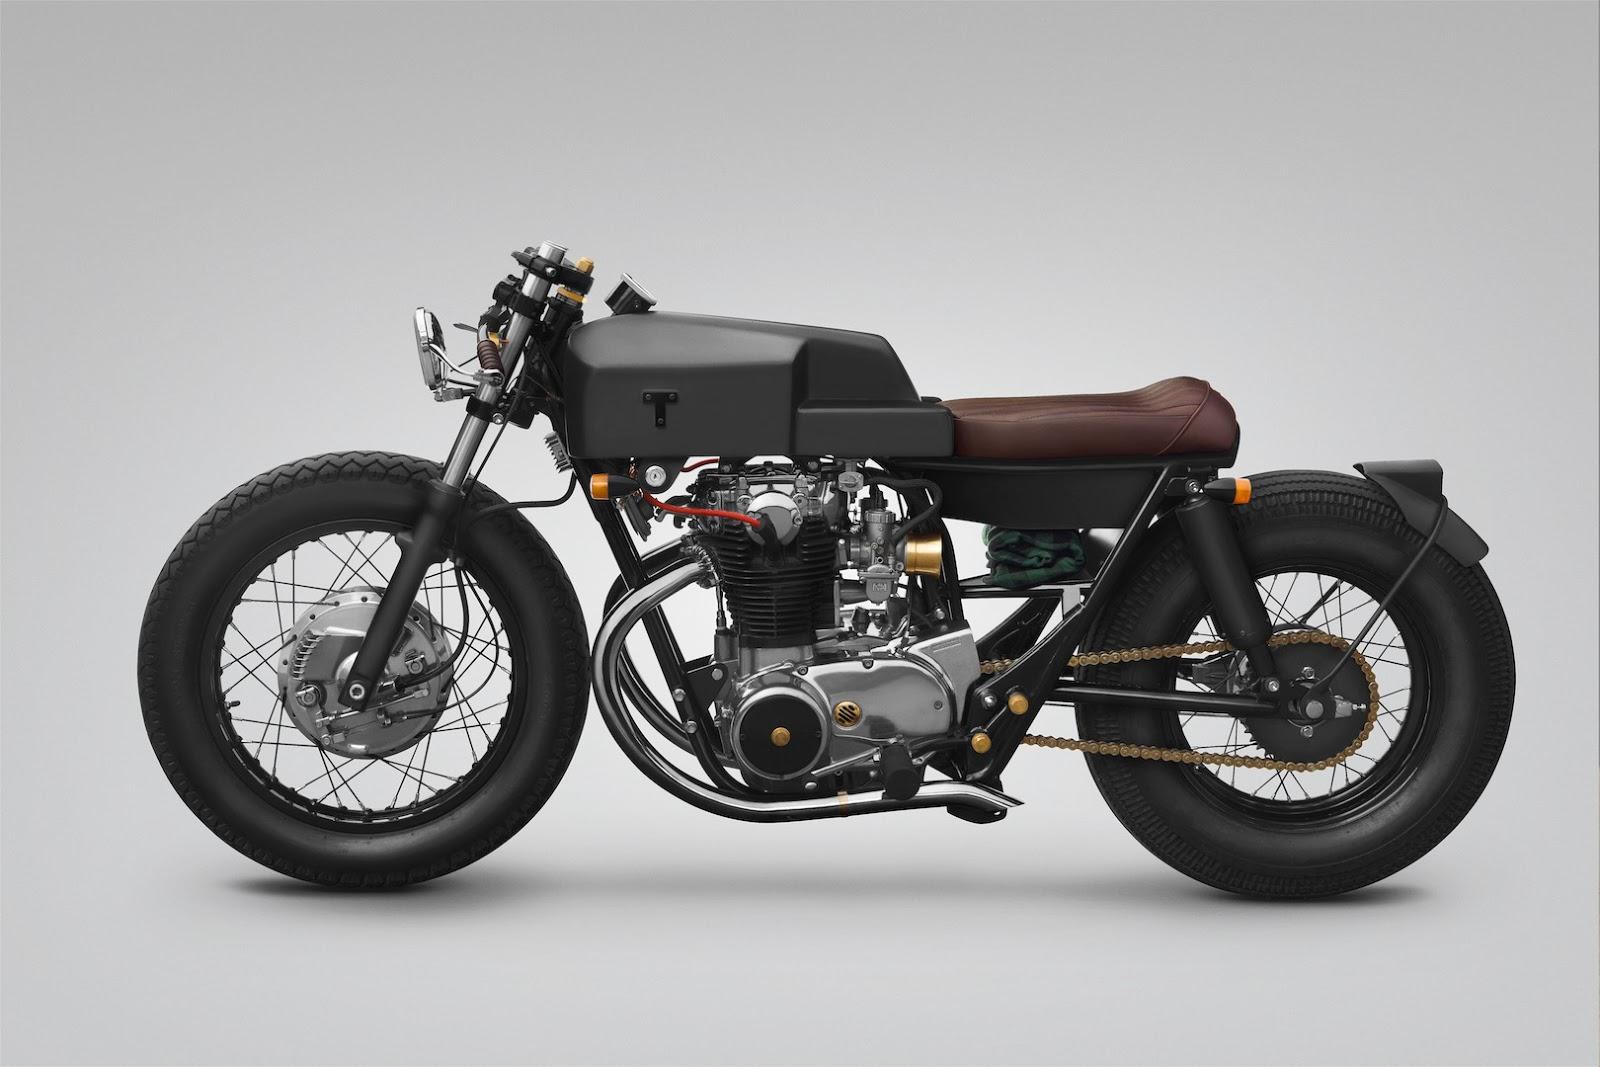 Moon_Yamaha_XS650_Thrive_Moto-Mucci (7)